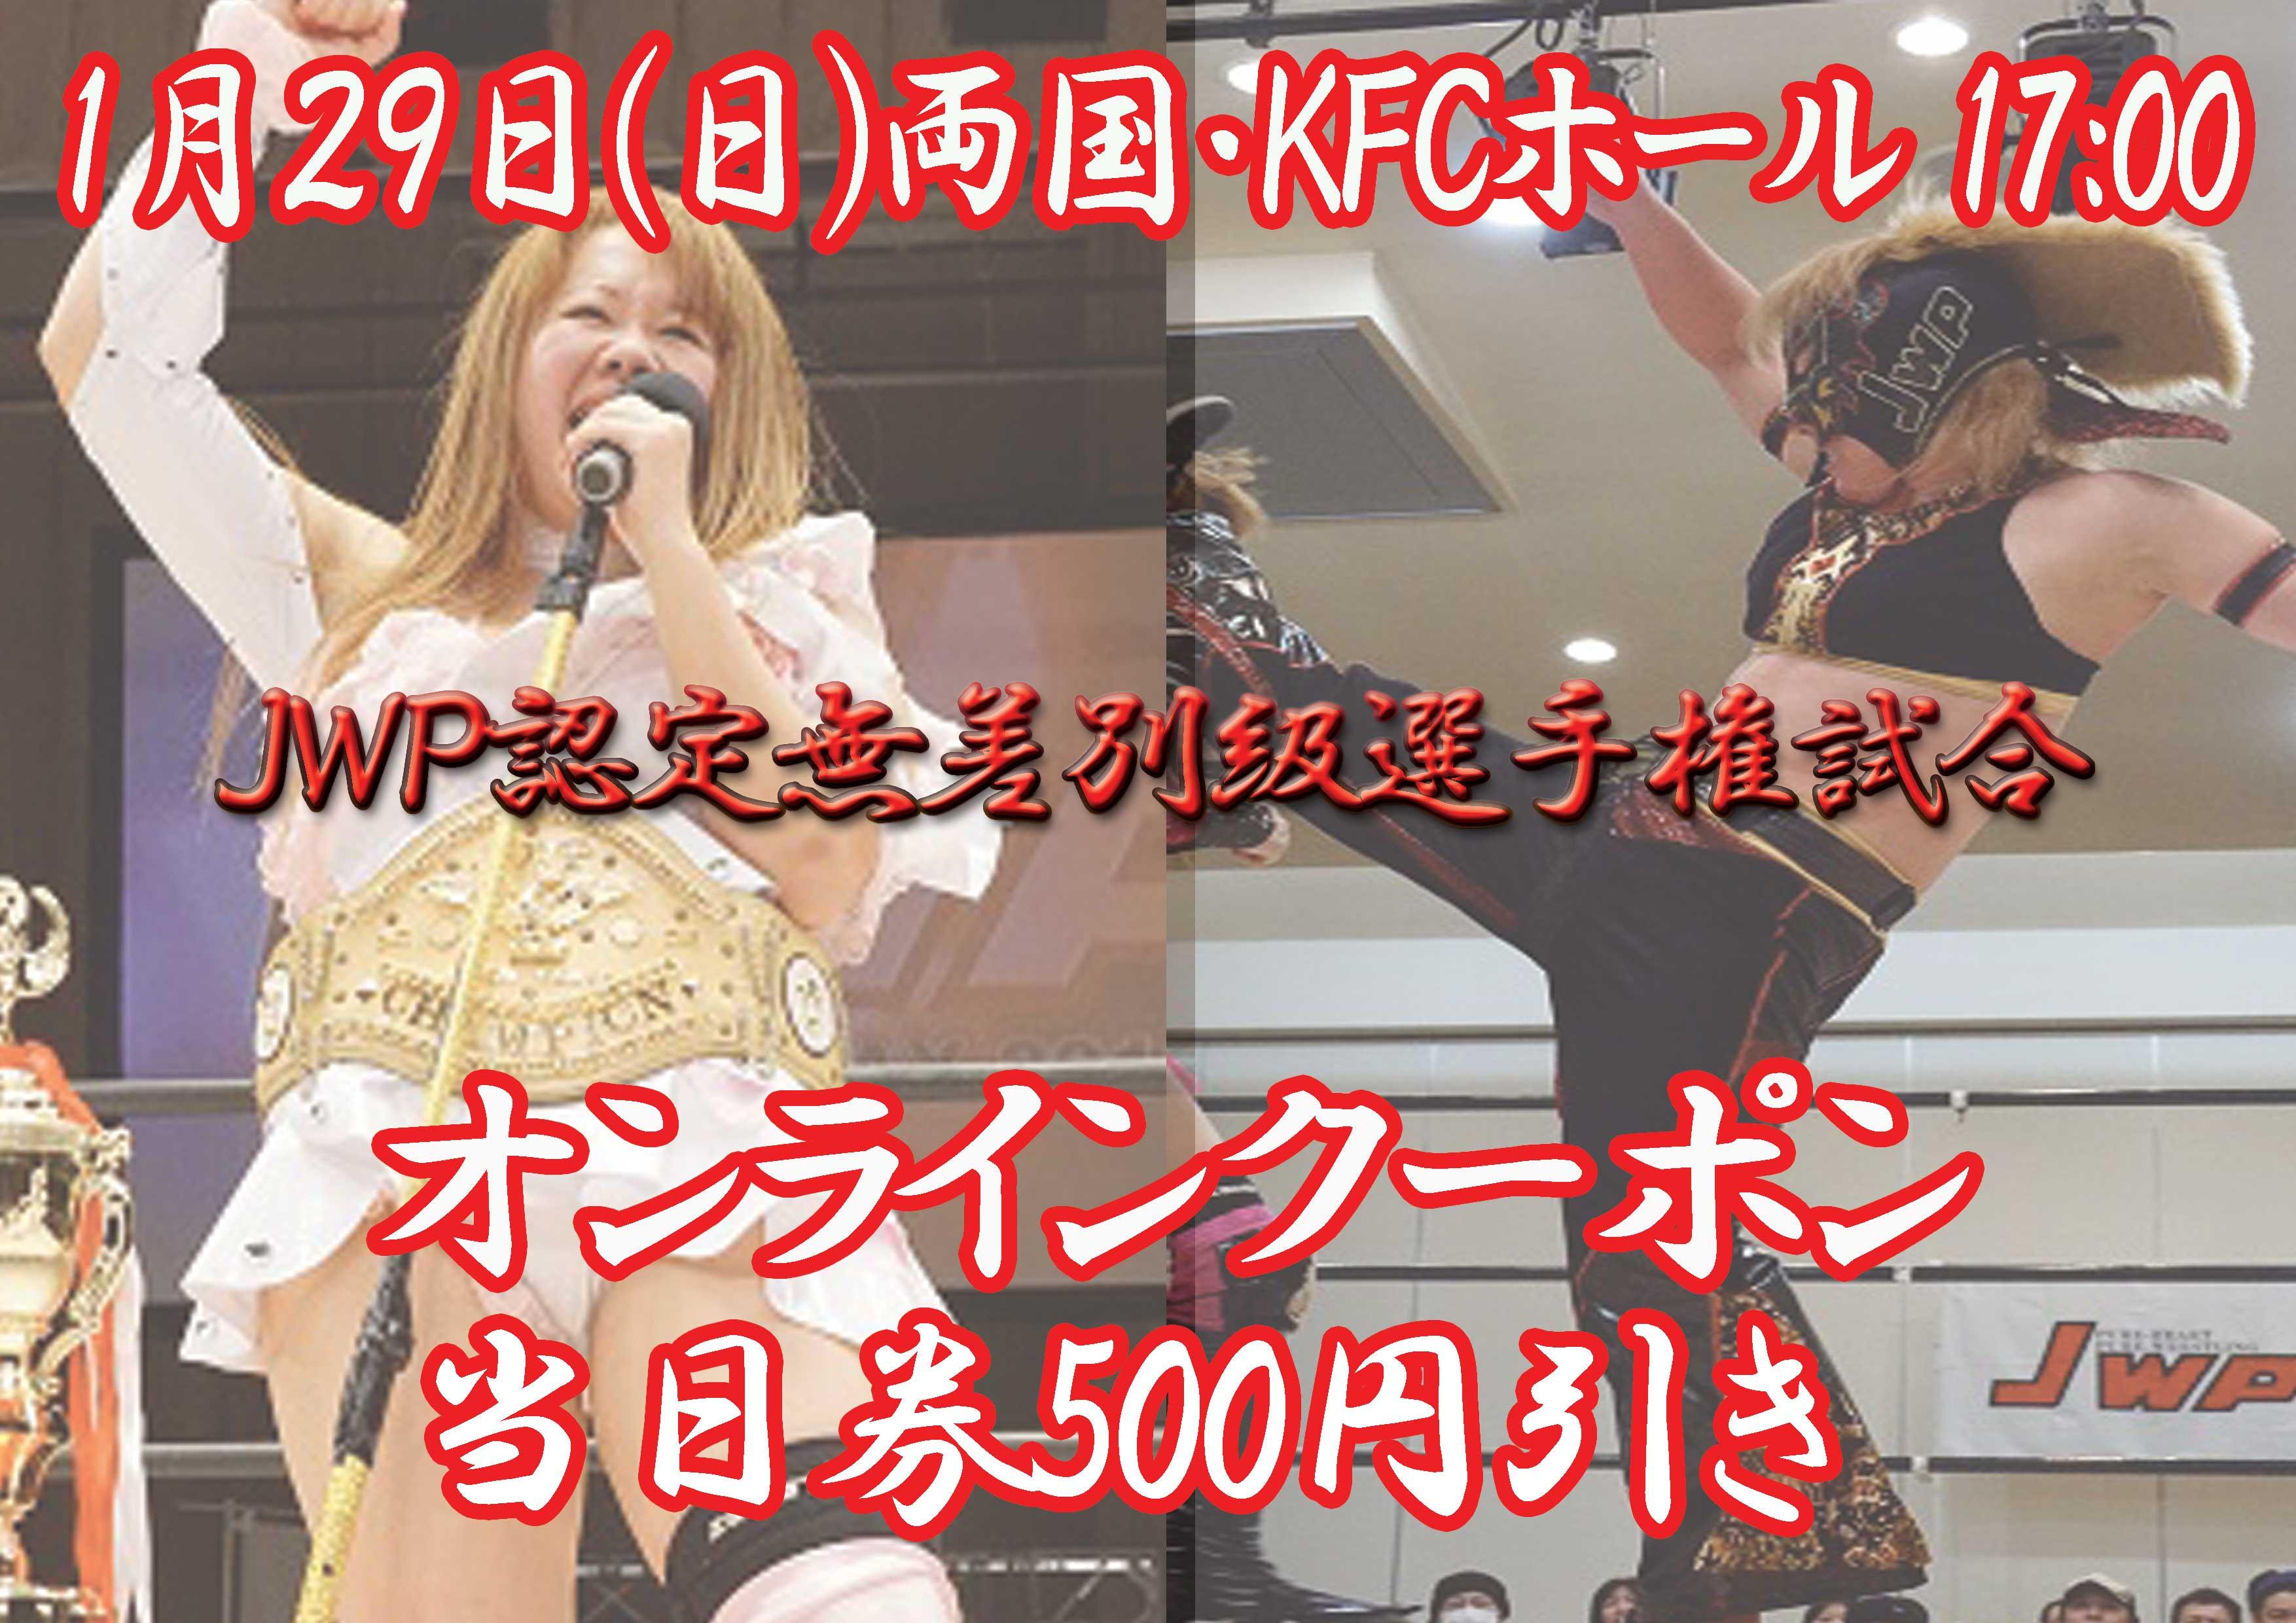 【JWP女子プロレス】1・29(日)両国・KFCホール大会直前情報!